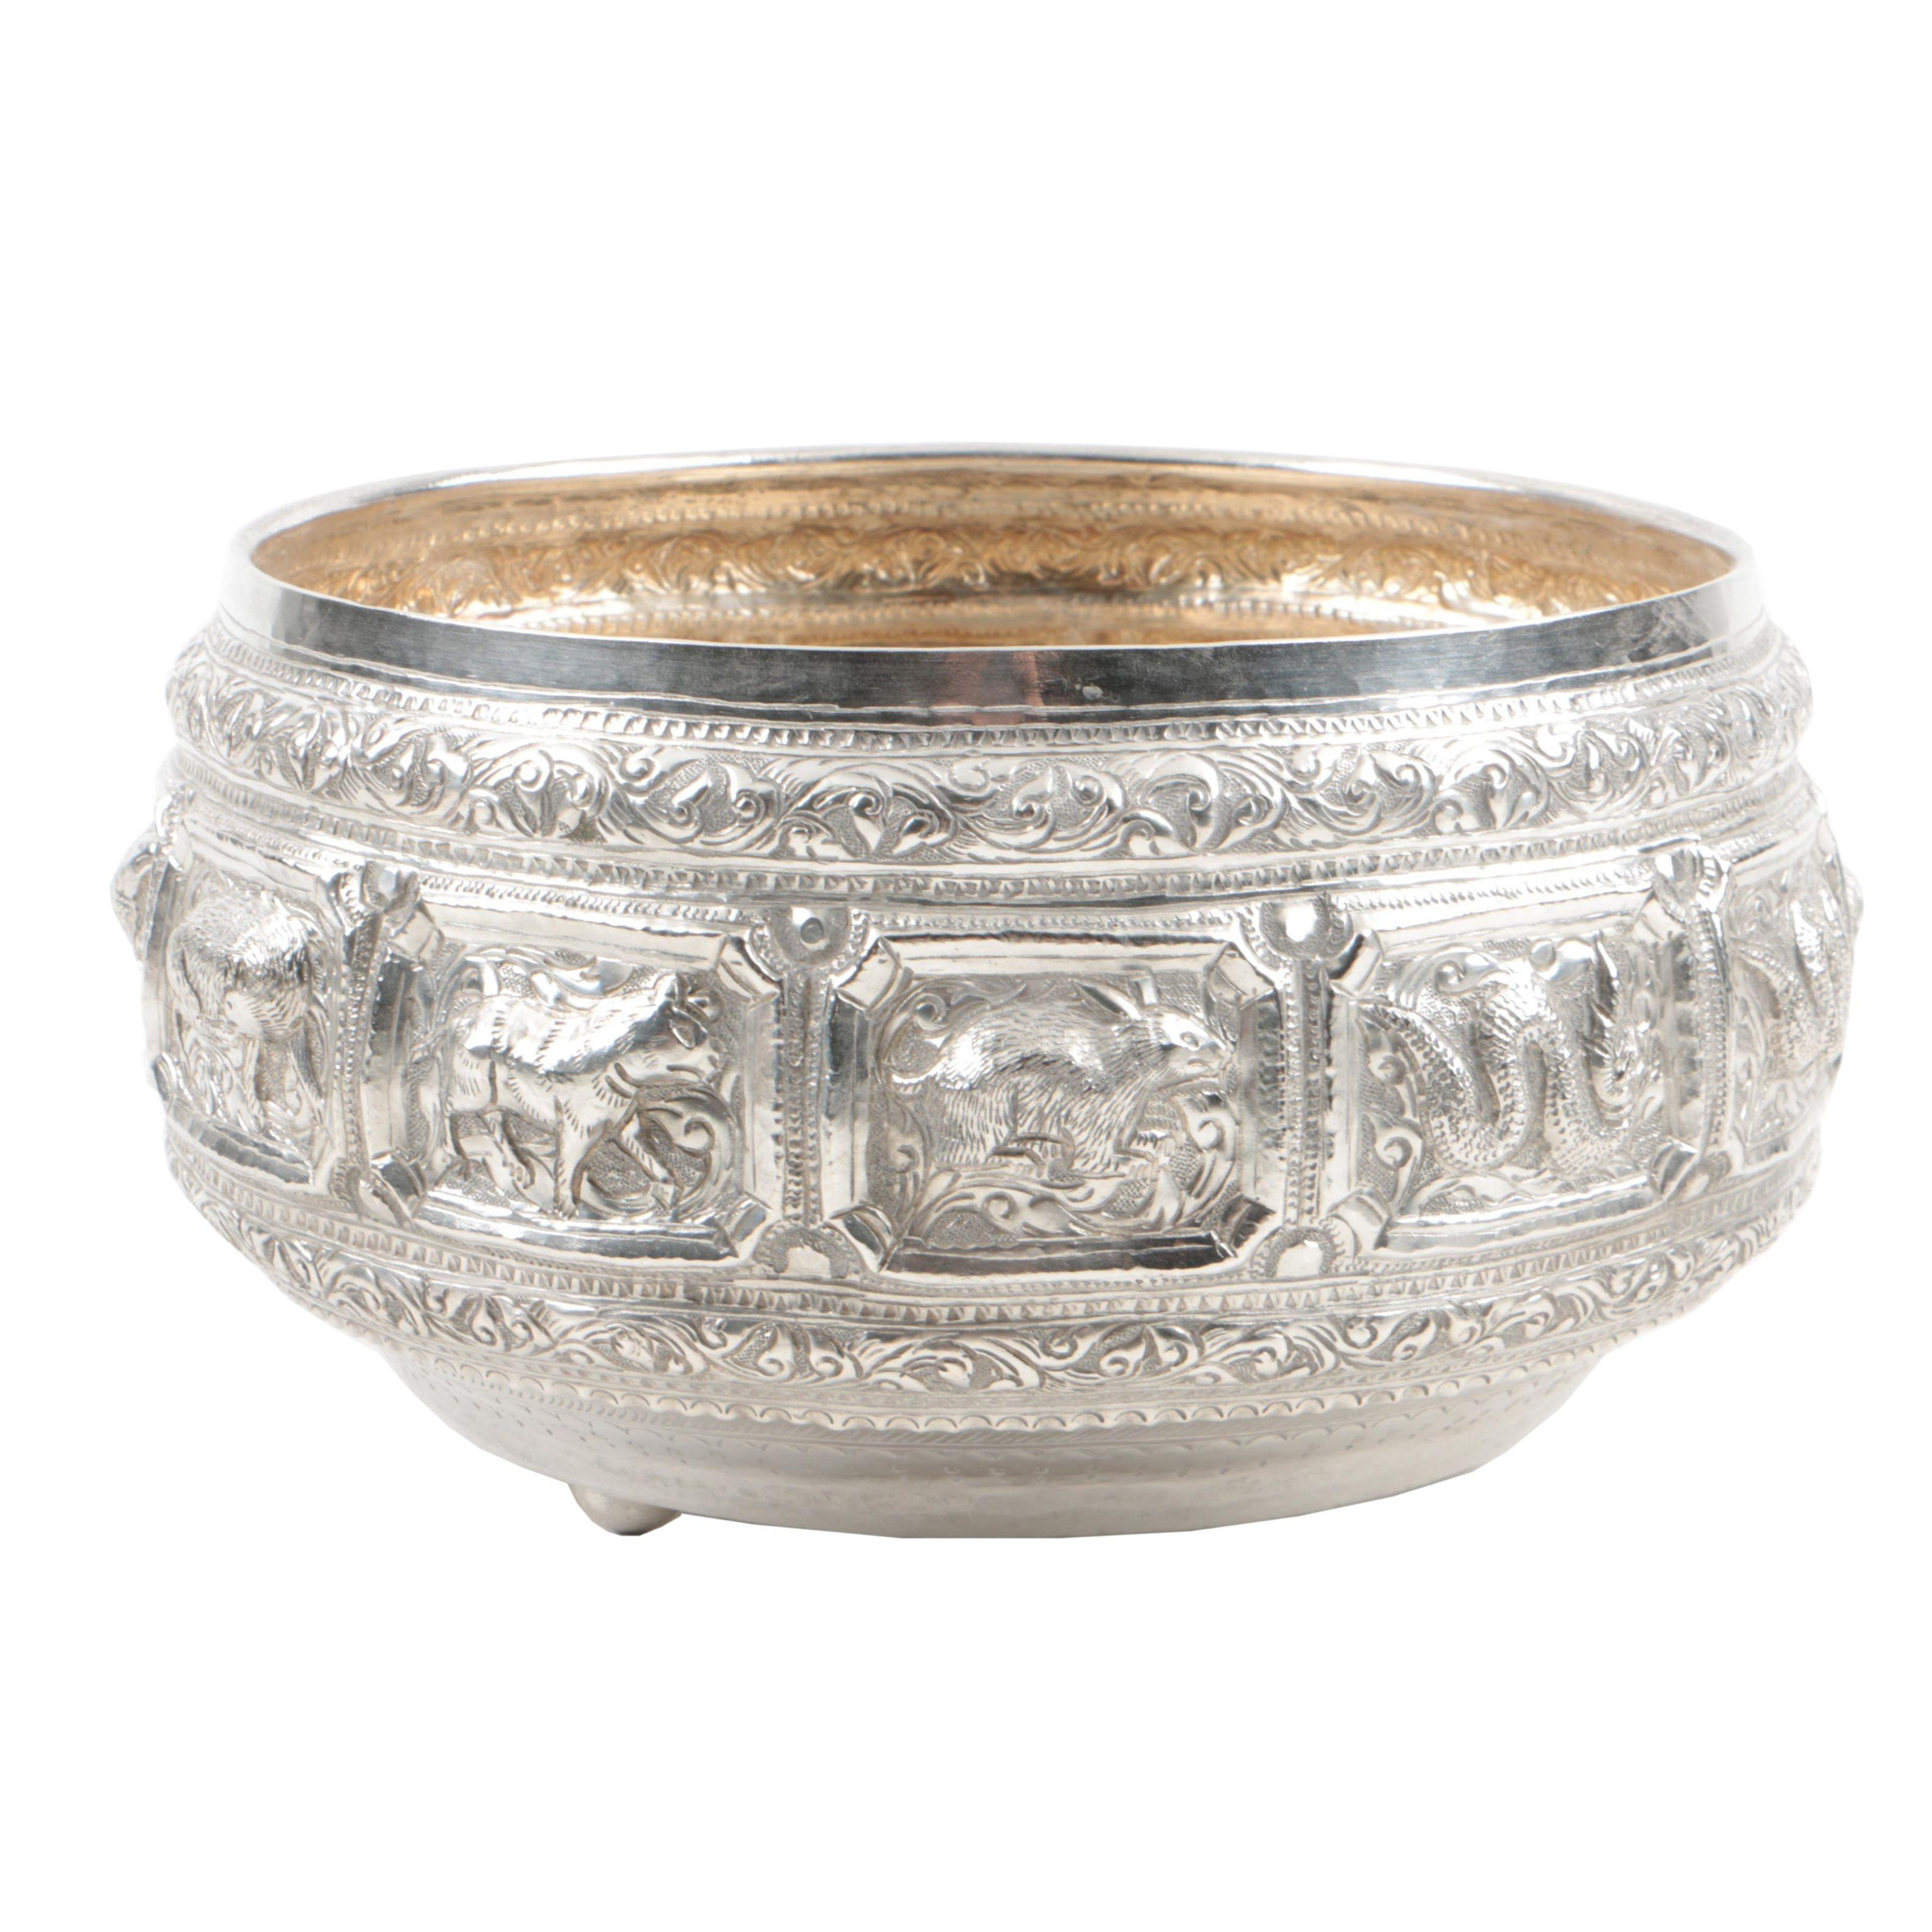 Burmese Silver Thabeik Bowl